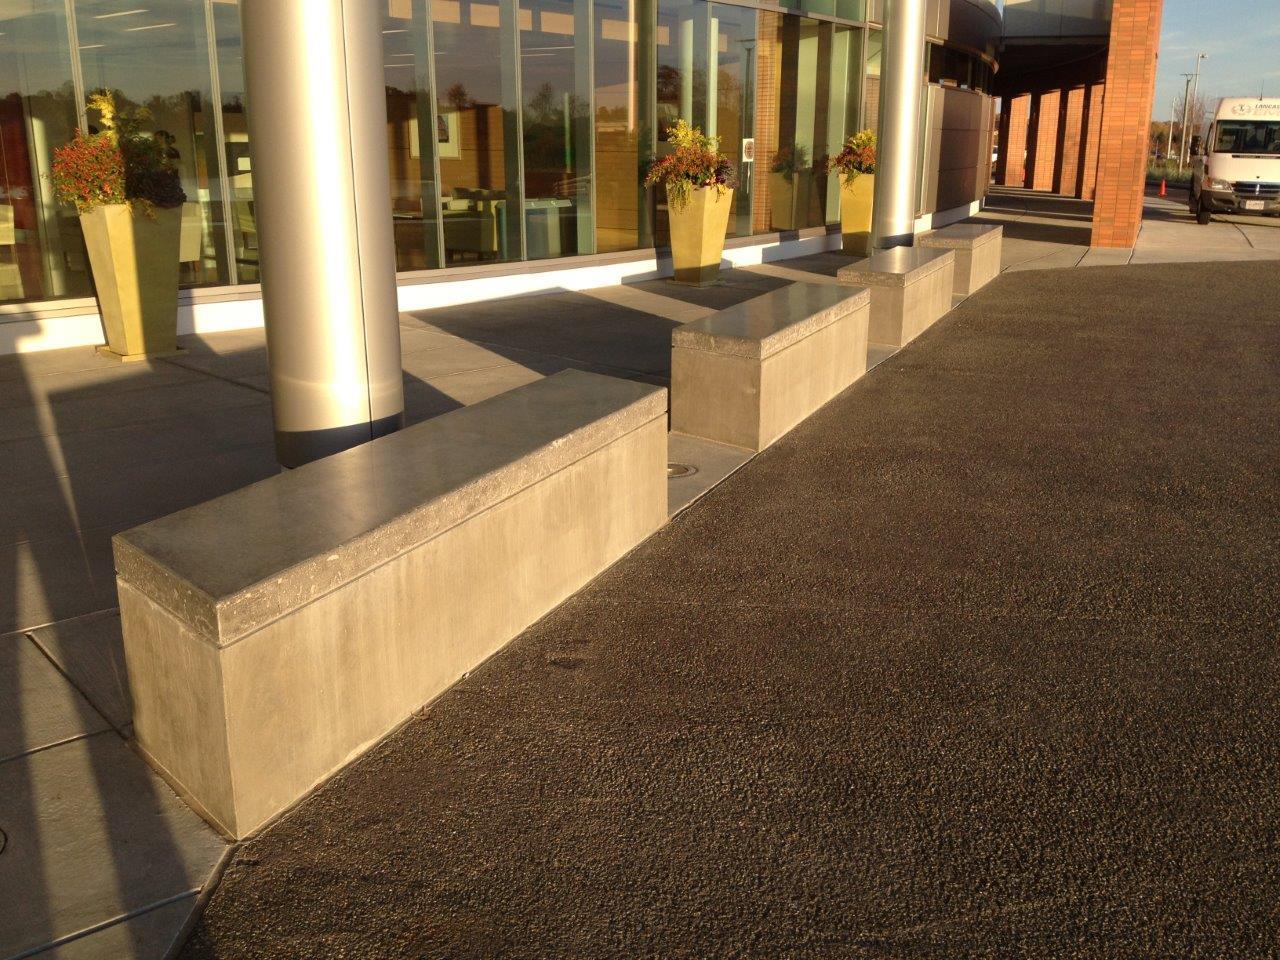 barshinger-benches-1